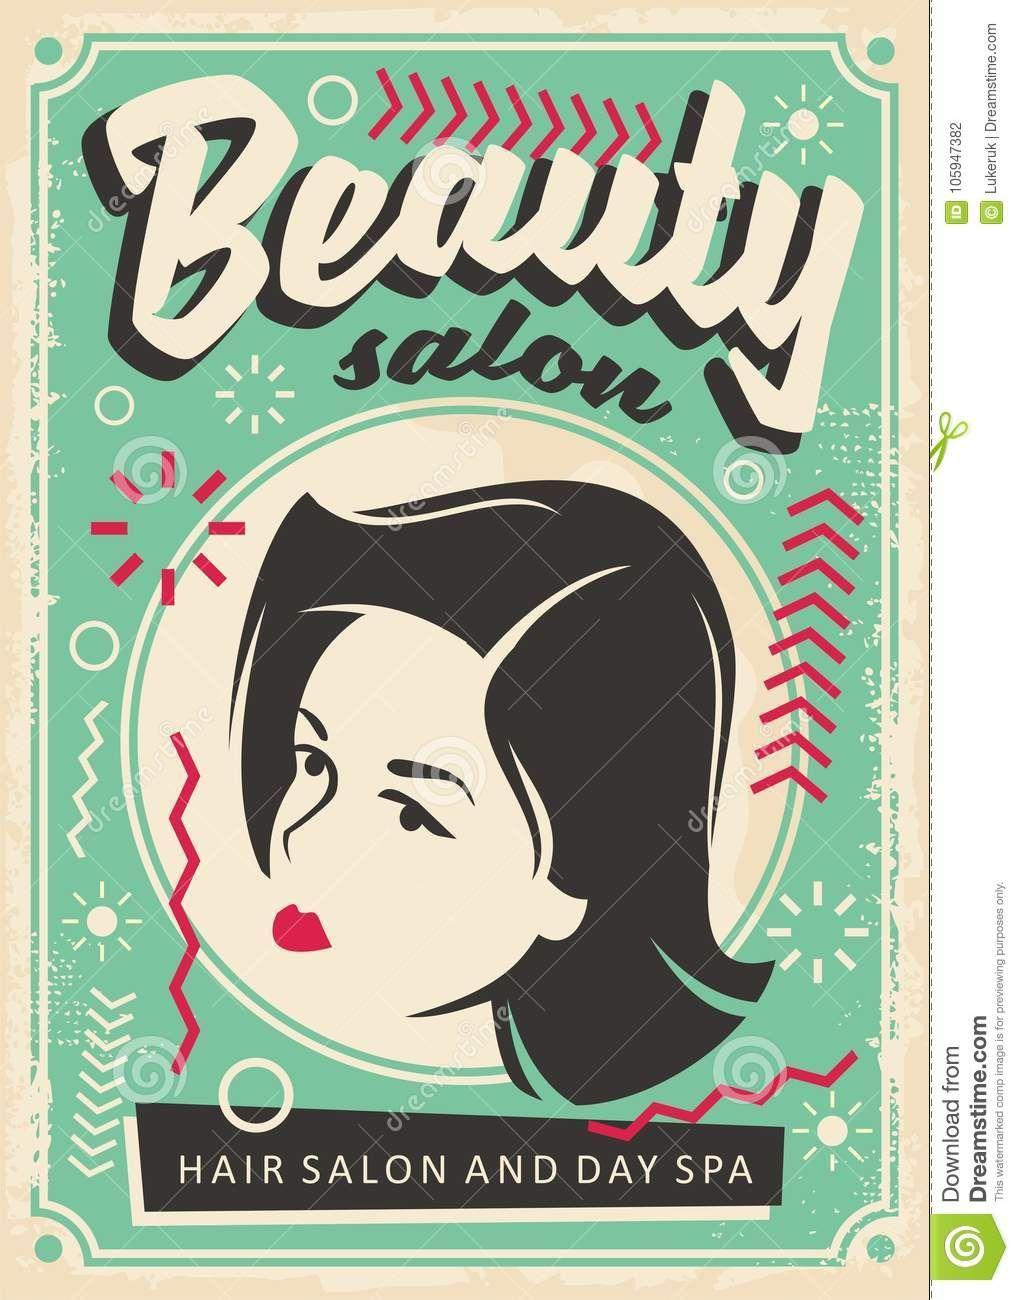 fd55fe63f33 Beauty Salon Retro Poster Design Stock Vector - Illustration of hairstyle,  graphic: 105947382